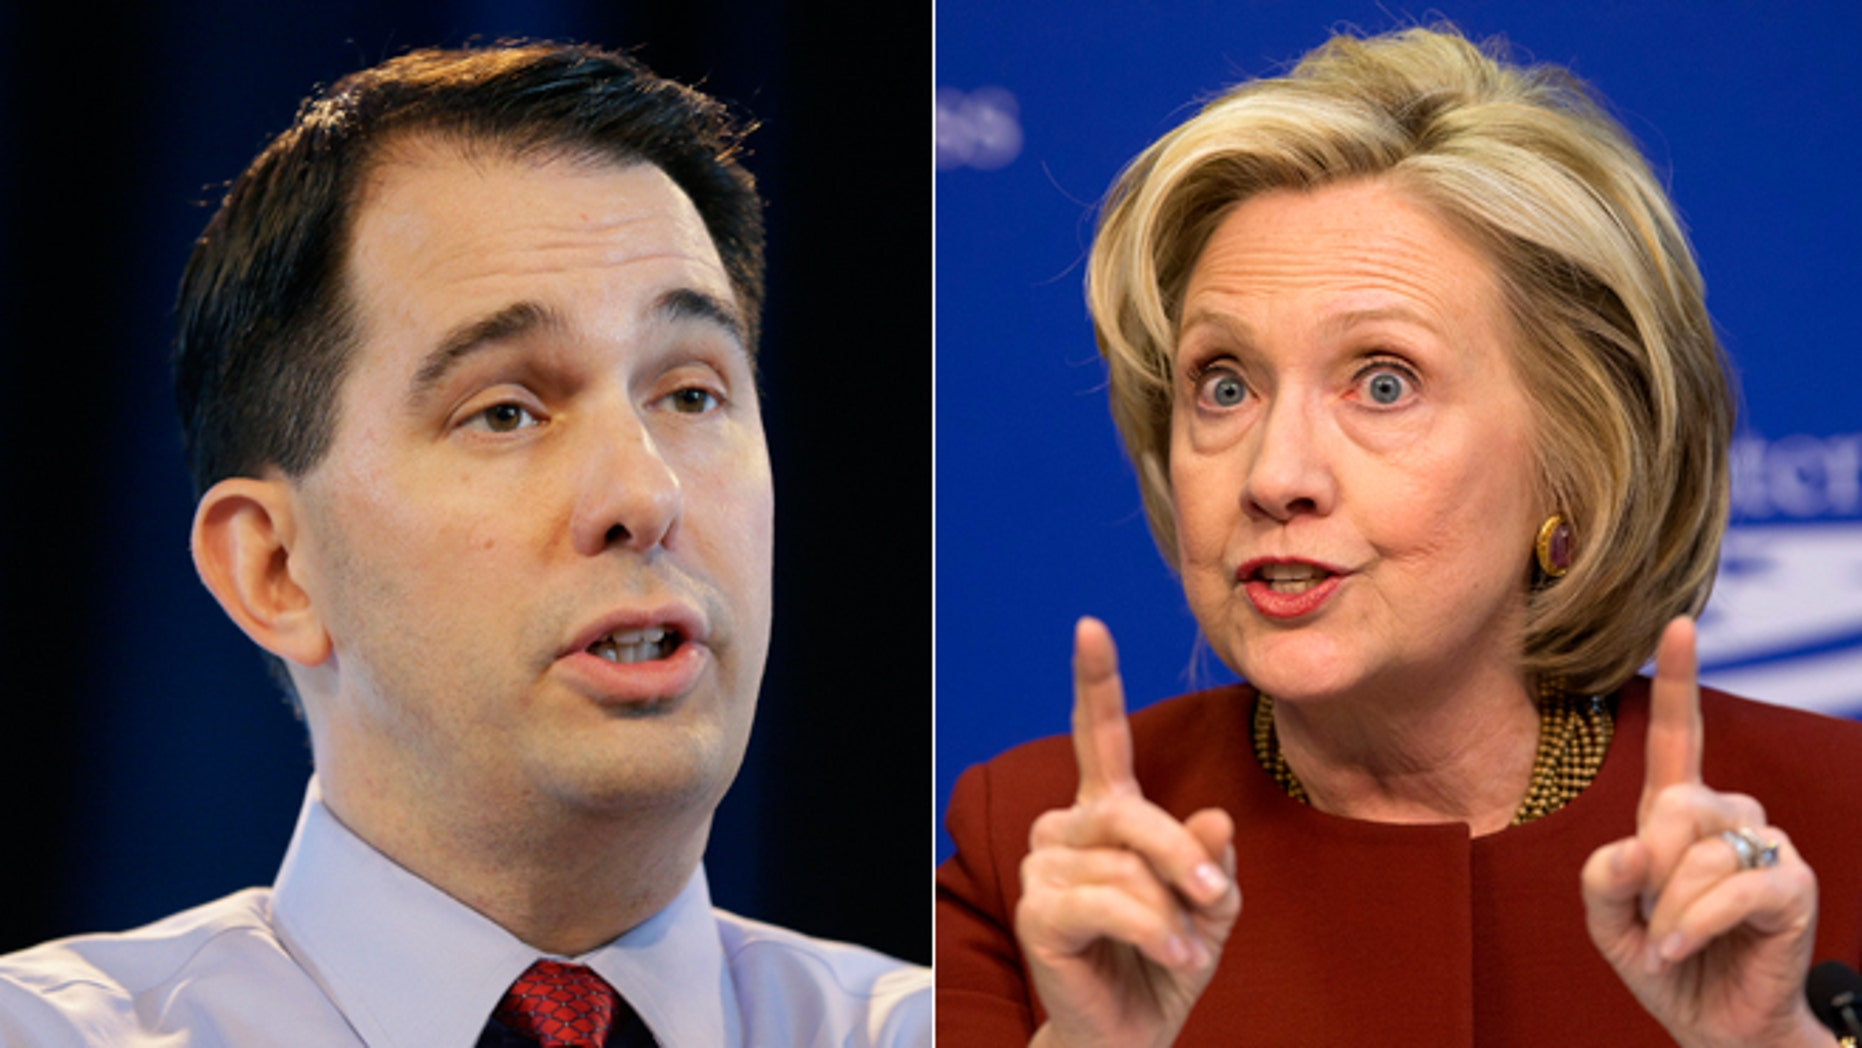 Wisconsin Gov. Scott Walker, left, former Sec. of State Hillary Clinton, right.